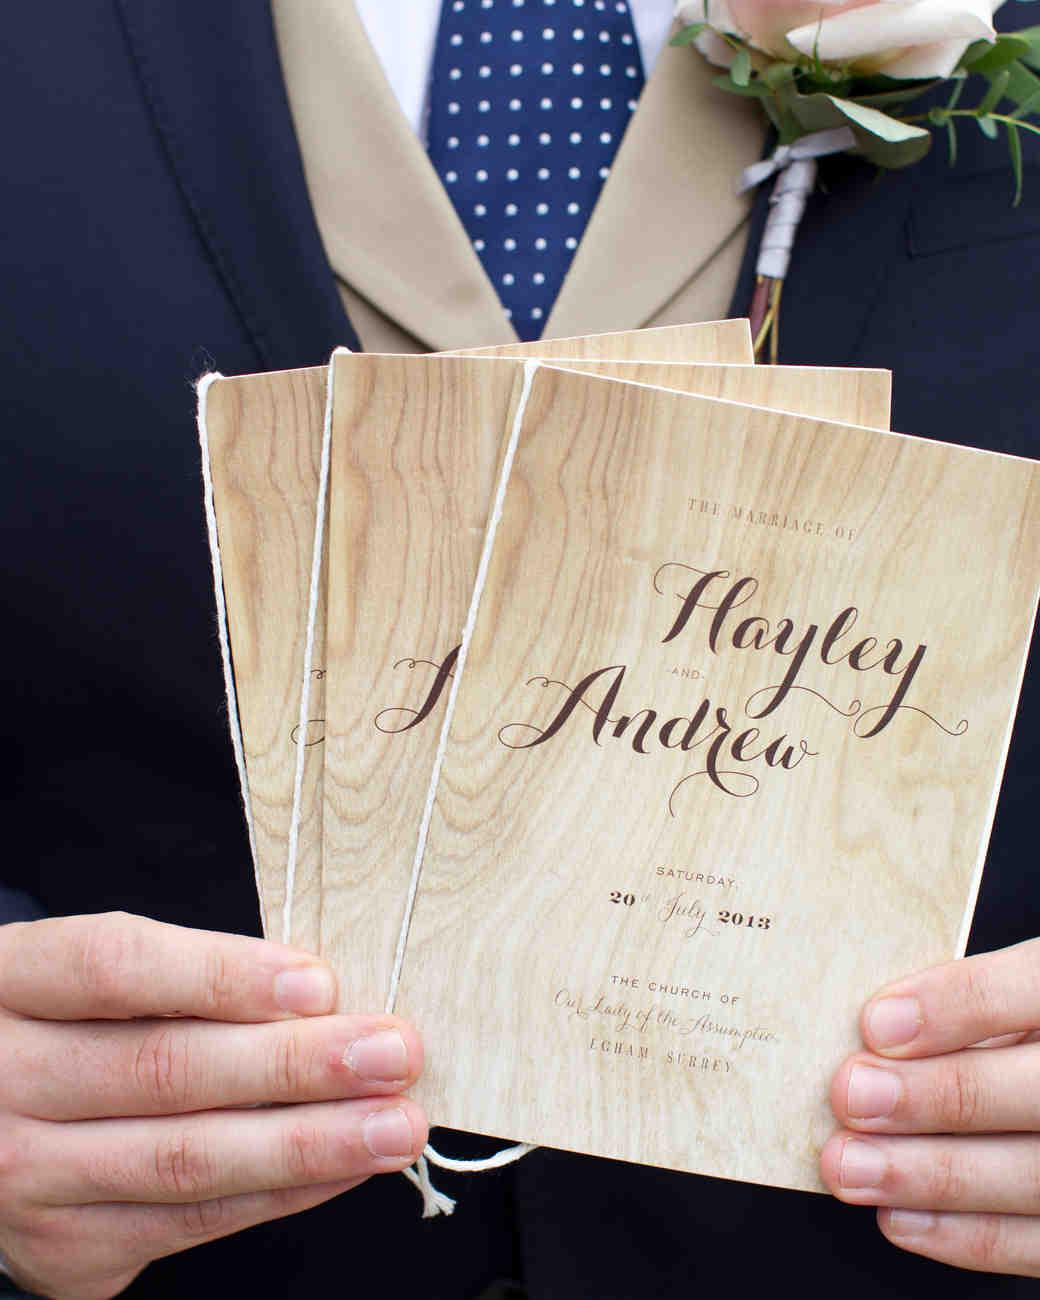 hayley-andrew-wedding-program-0714.jpg